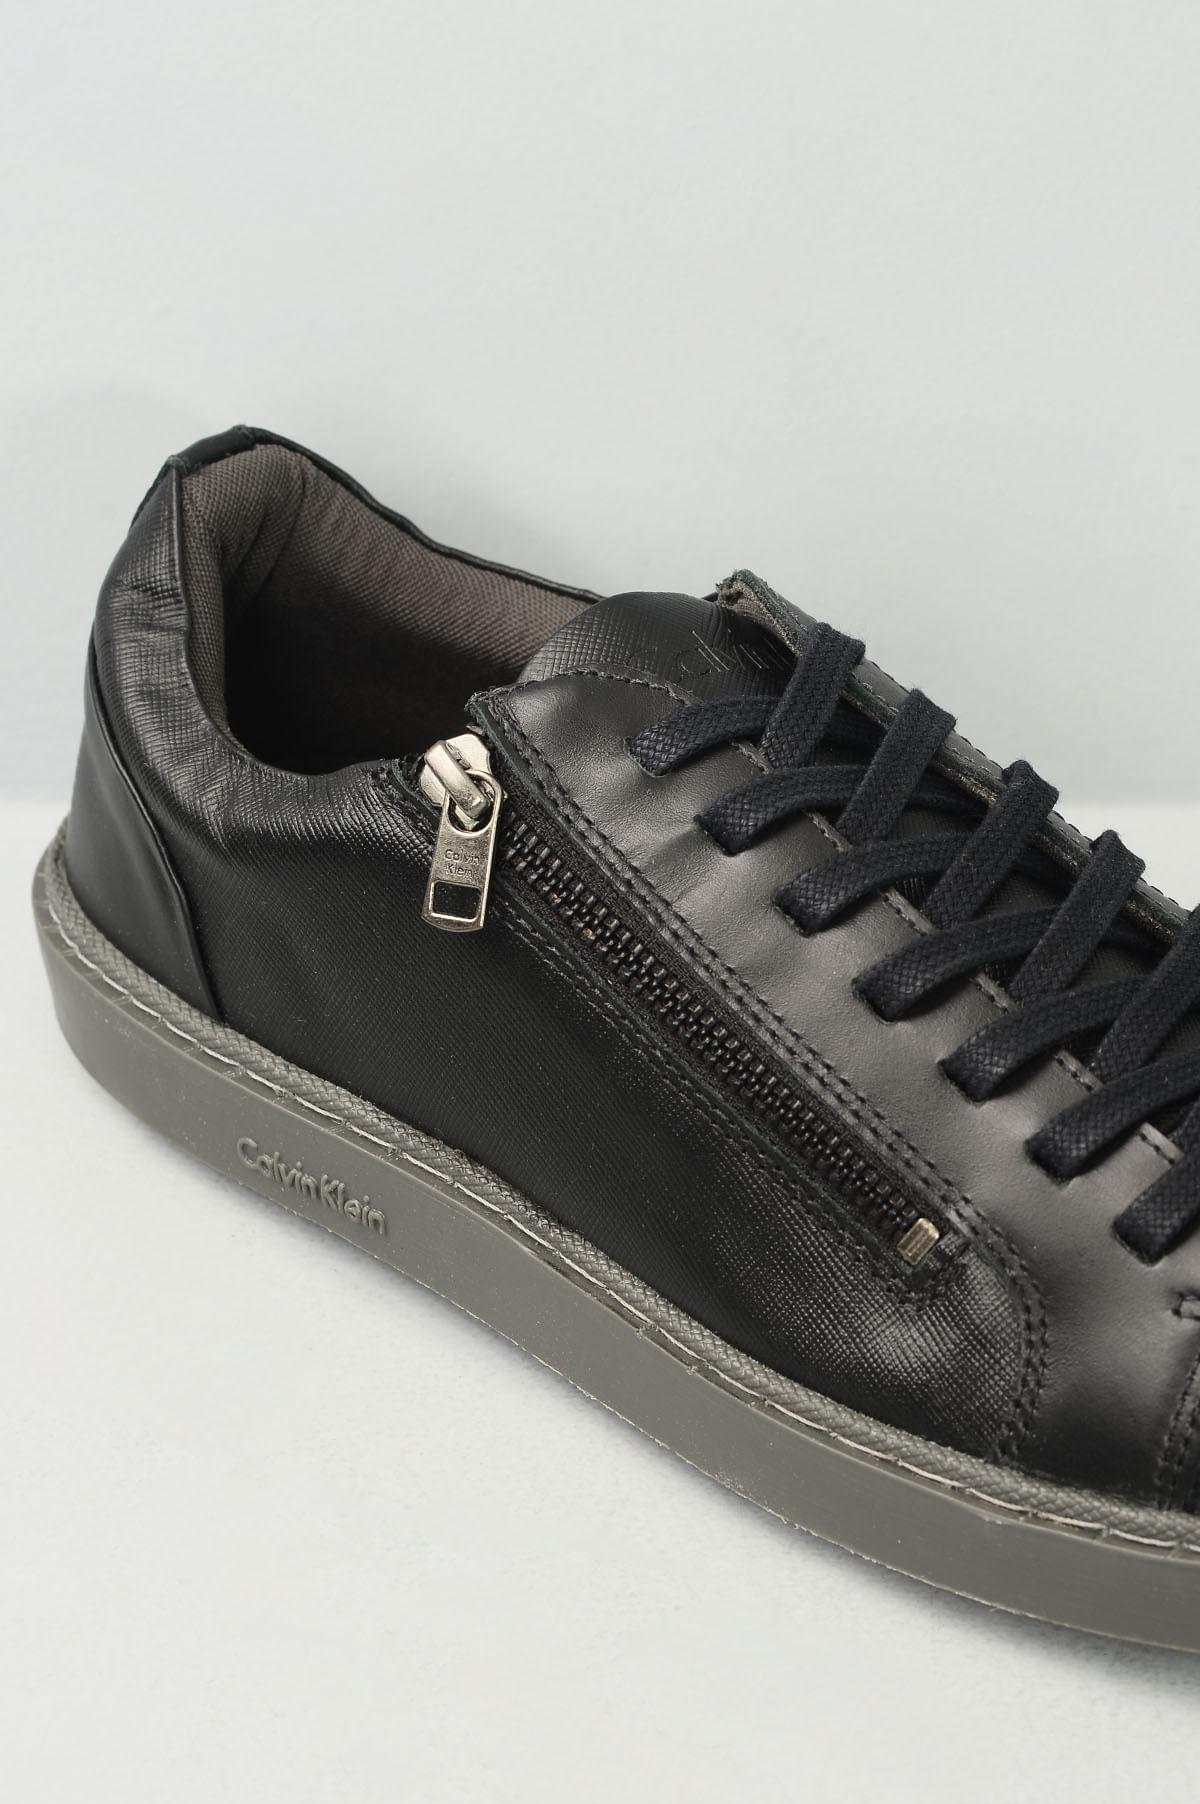 ccf08ecb6f7 Sapatênis Masculino Calvin Klein Vinicius CR-PRETO - Mundial Calçados